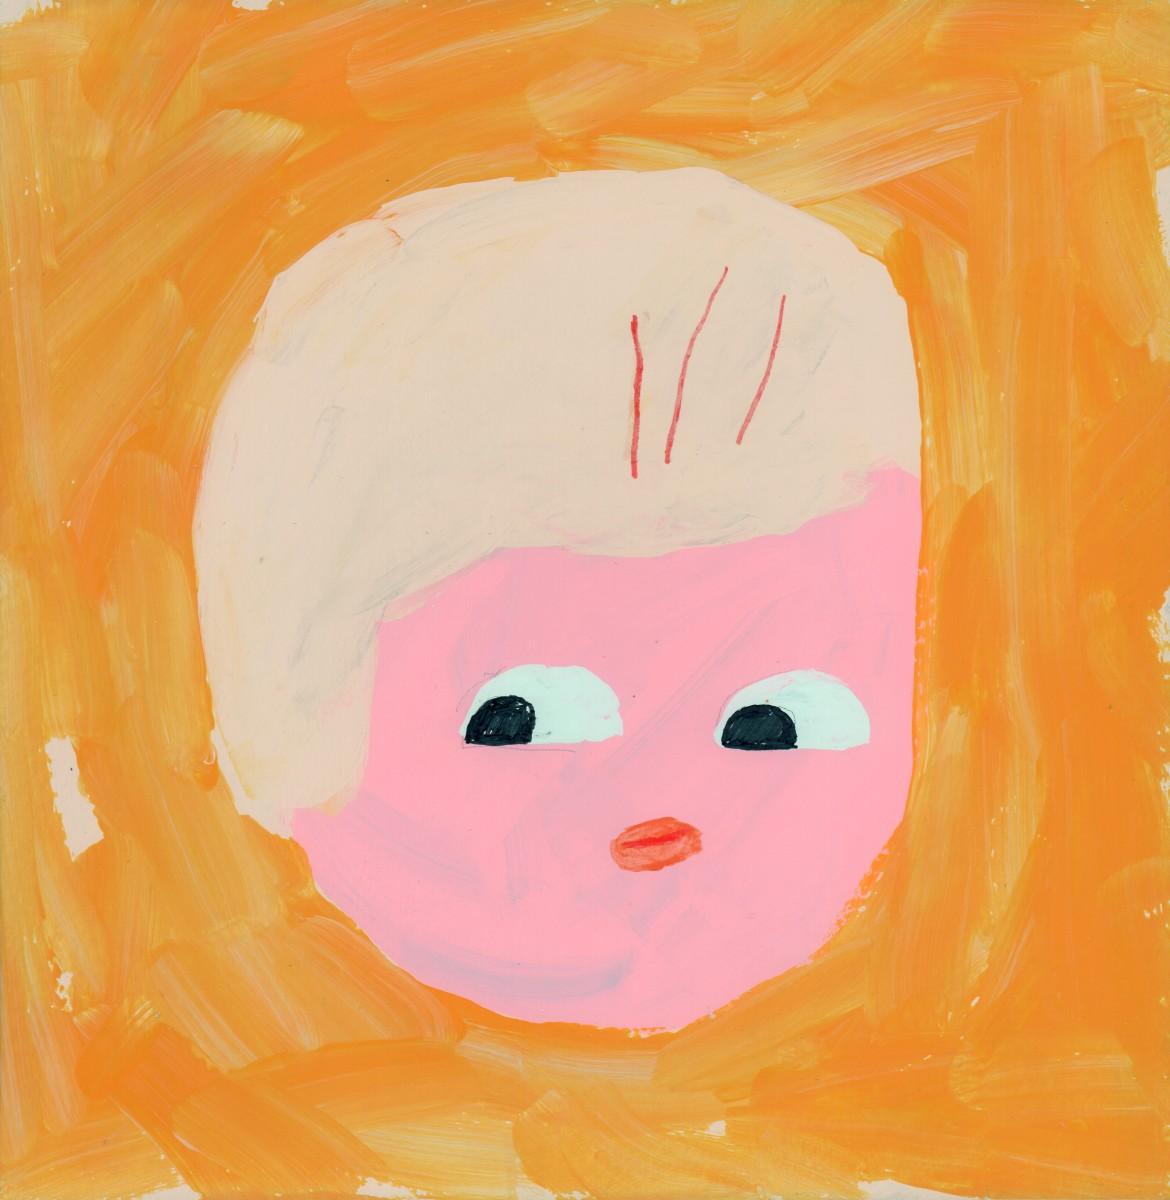 pink-baby-b0b0004f109be994f52f9dac2a15351c